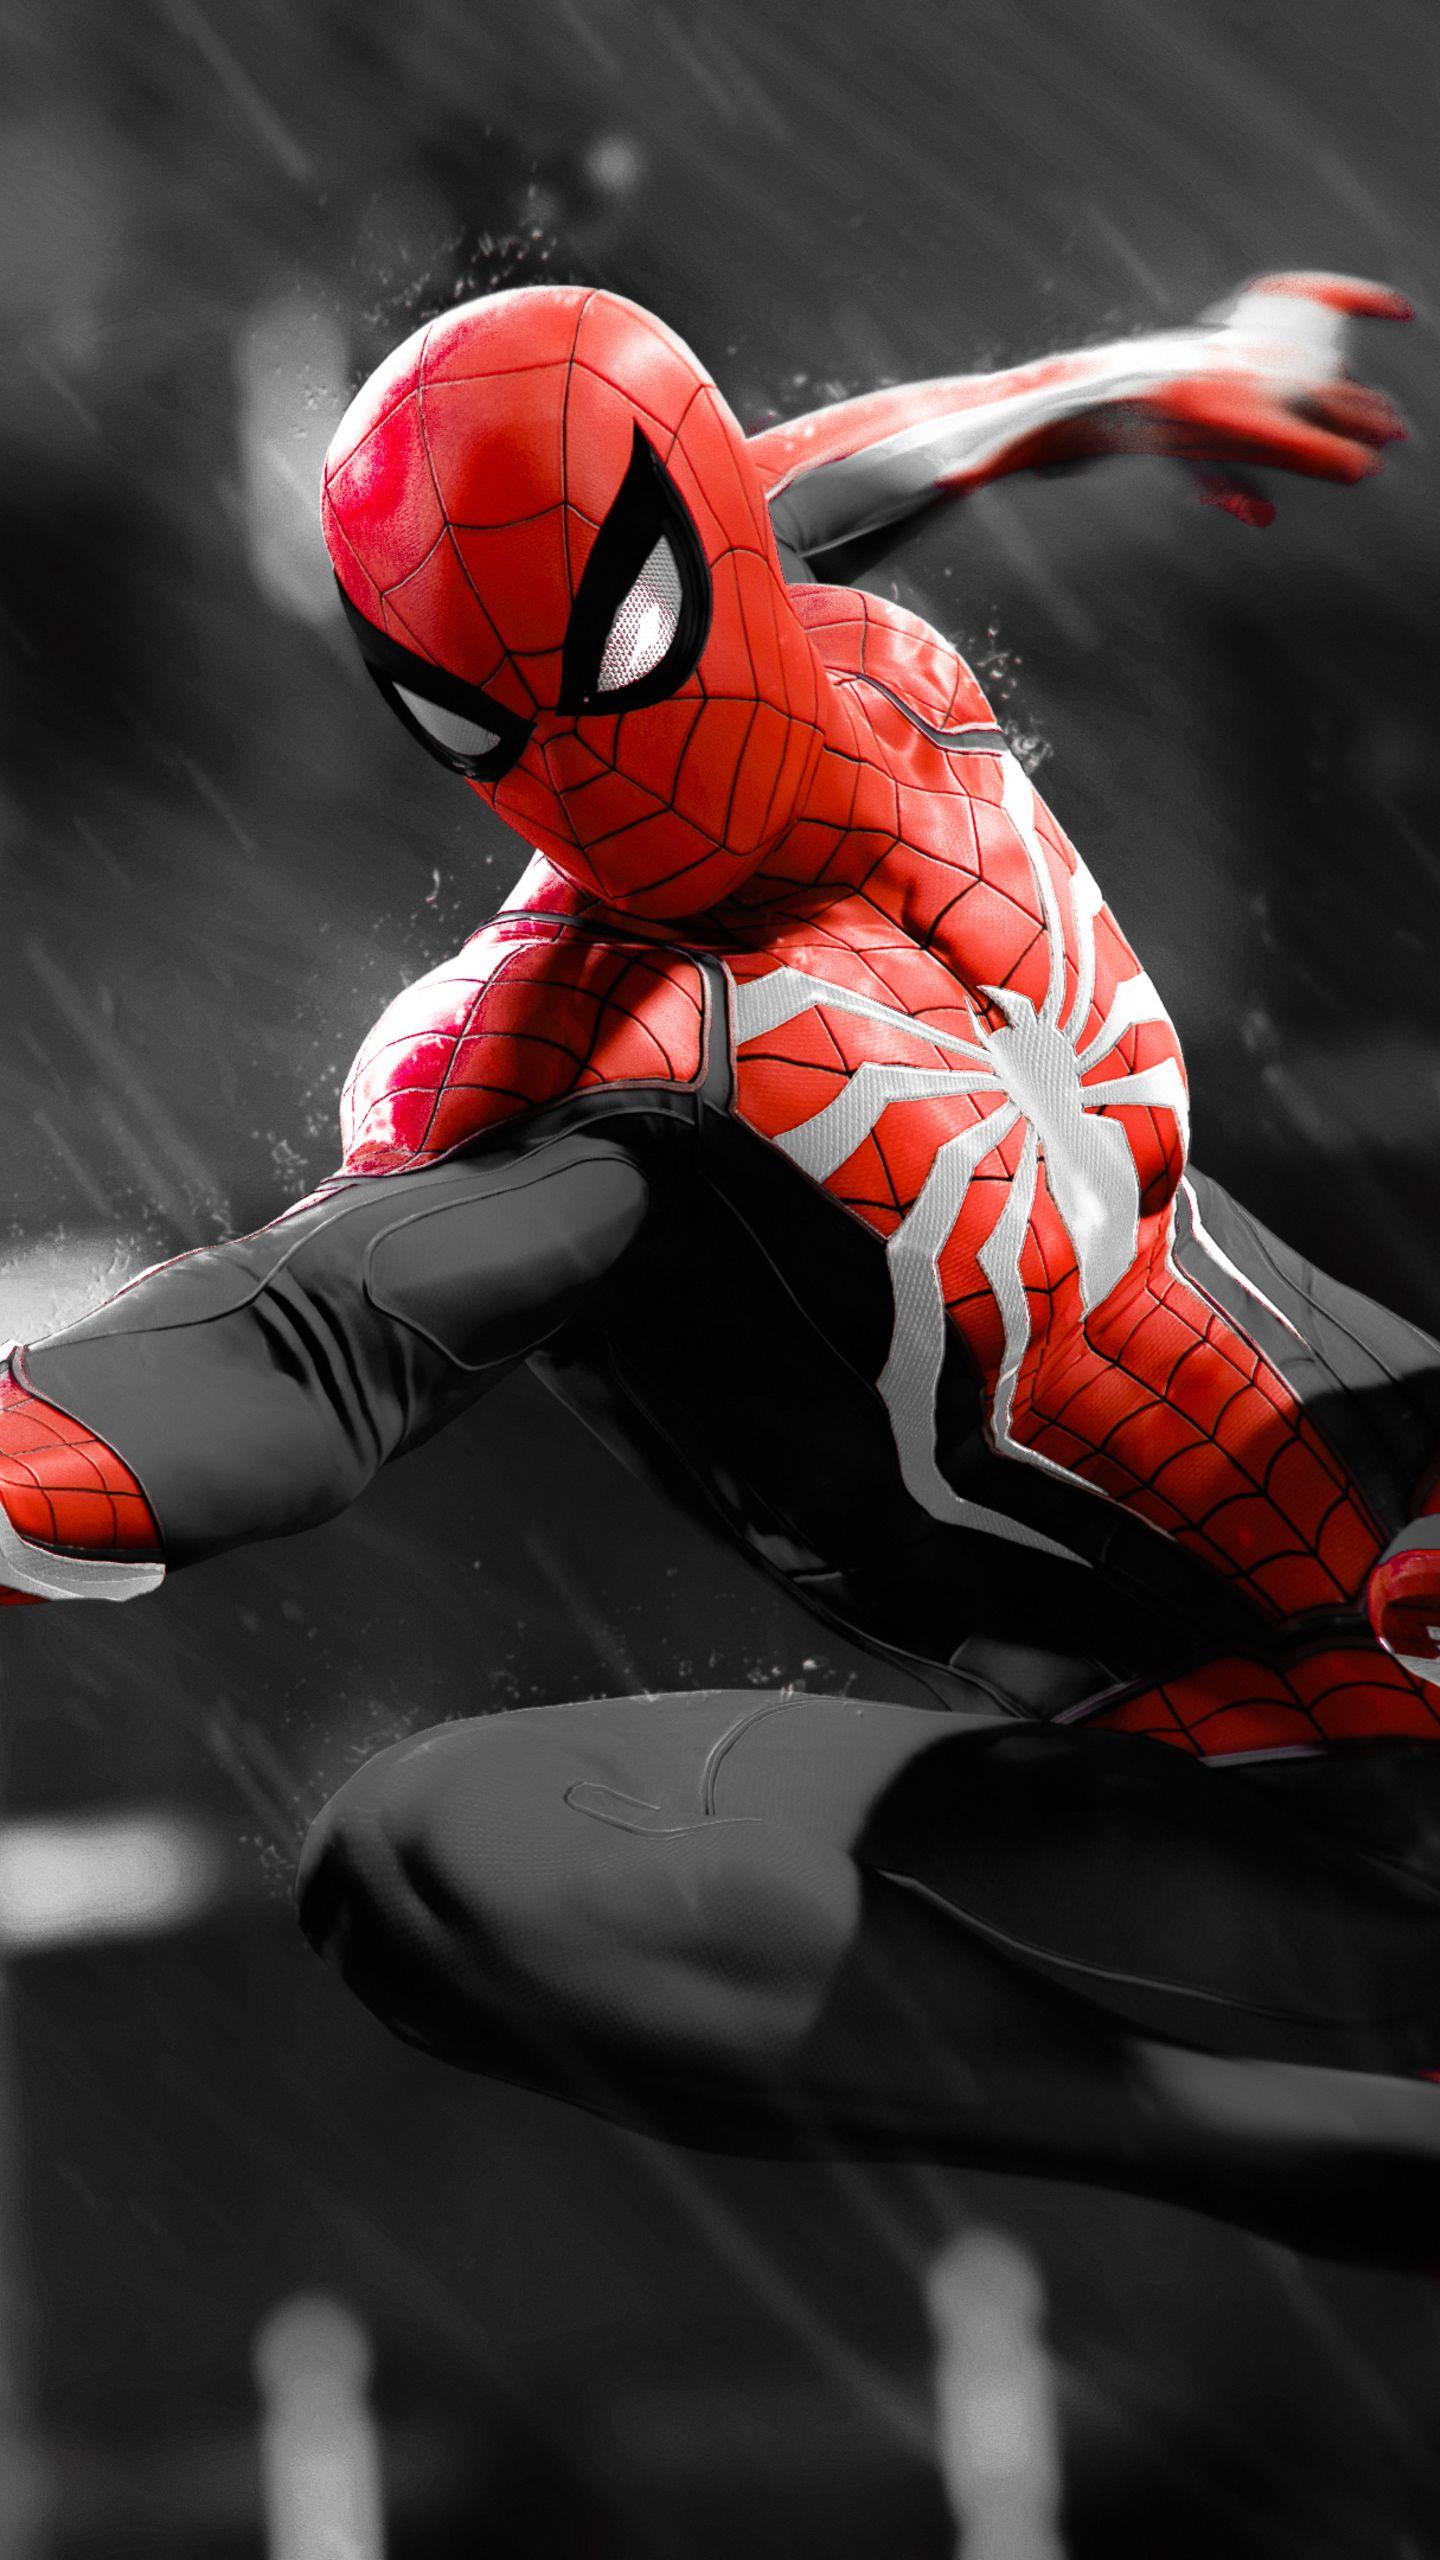 Spiderman Quiz  Marvel Fans Fail This Spiderman Peterparker Poster